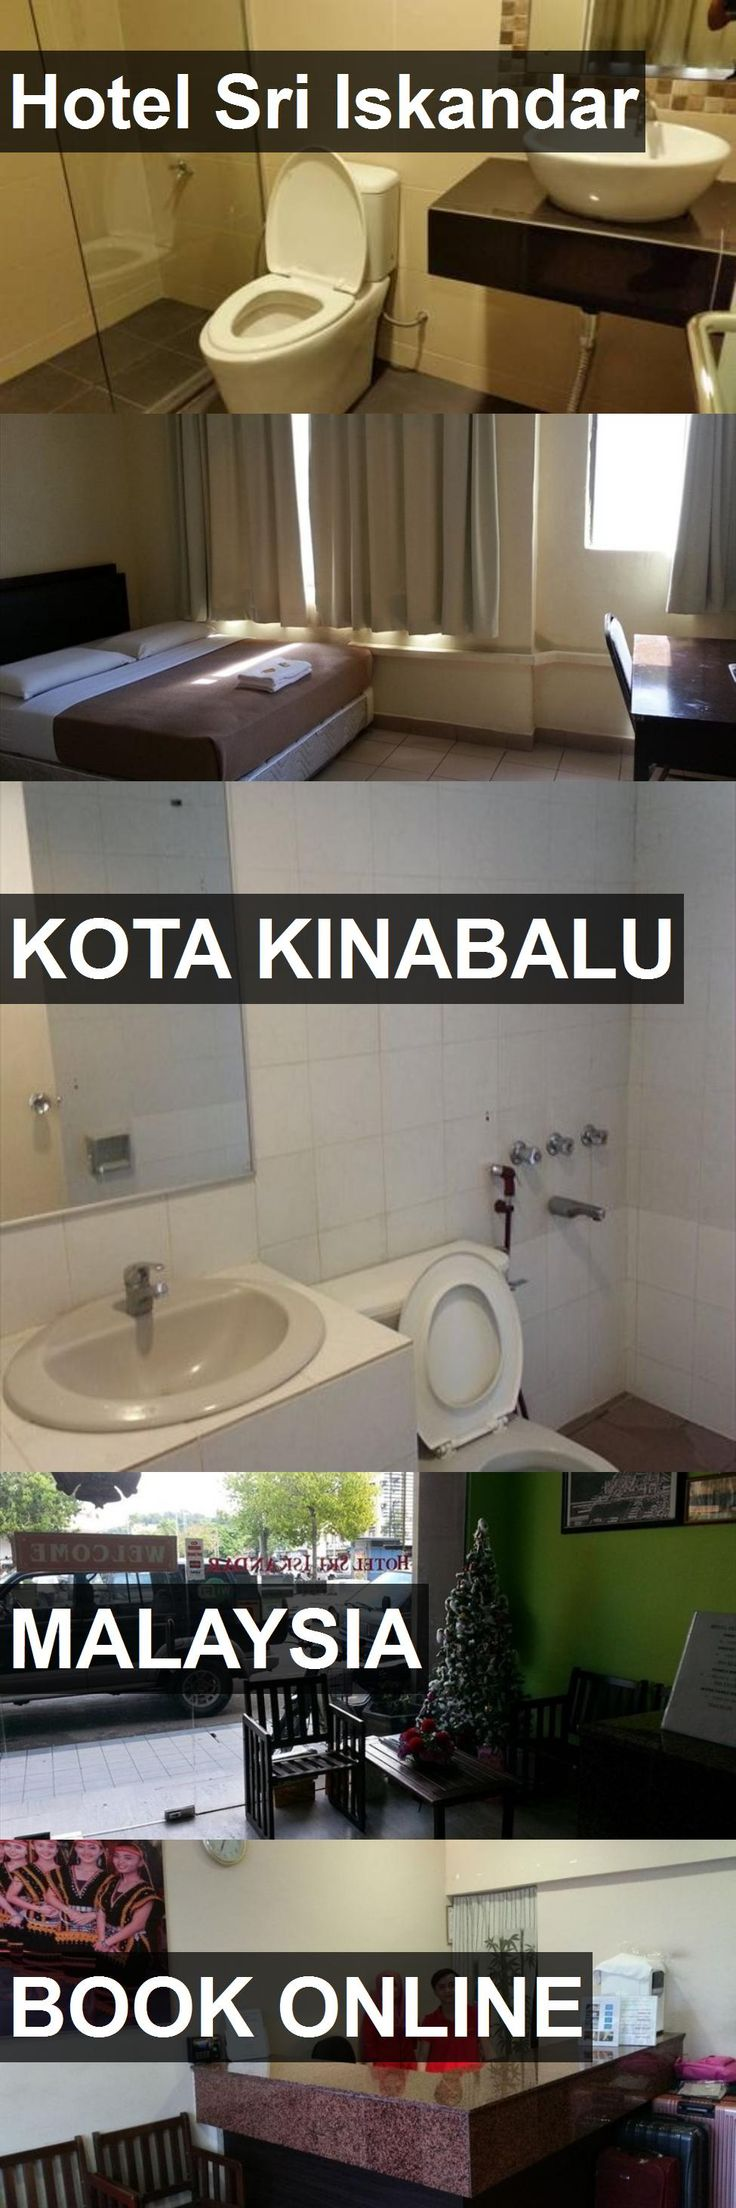 hotel hotel sri iskandar in kota kinabalu malaysia for more information photos - Bathroom Accessories Kota Kinabalu